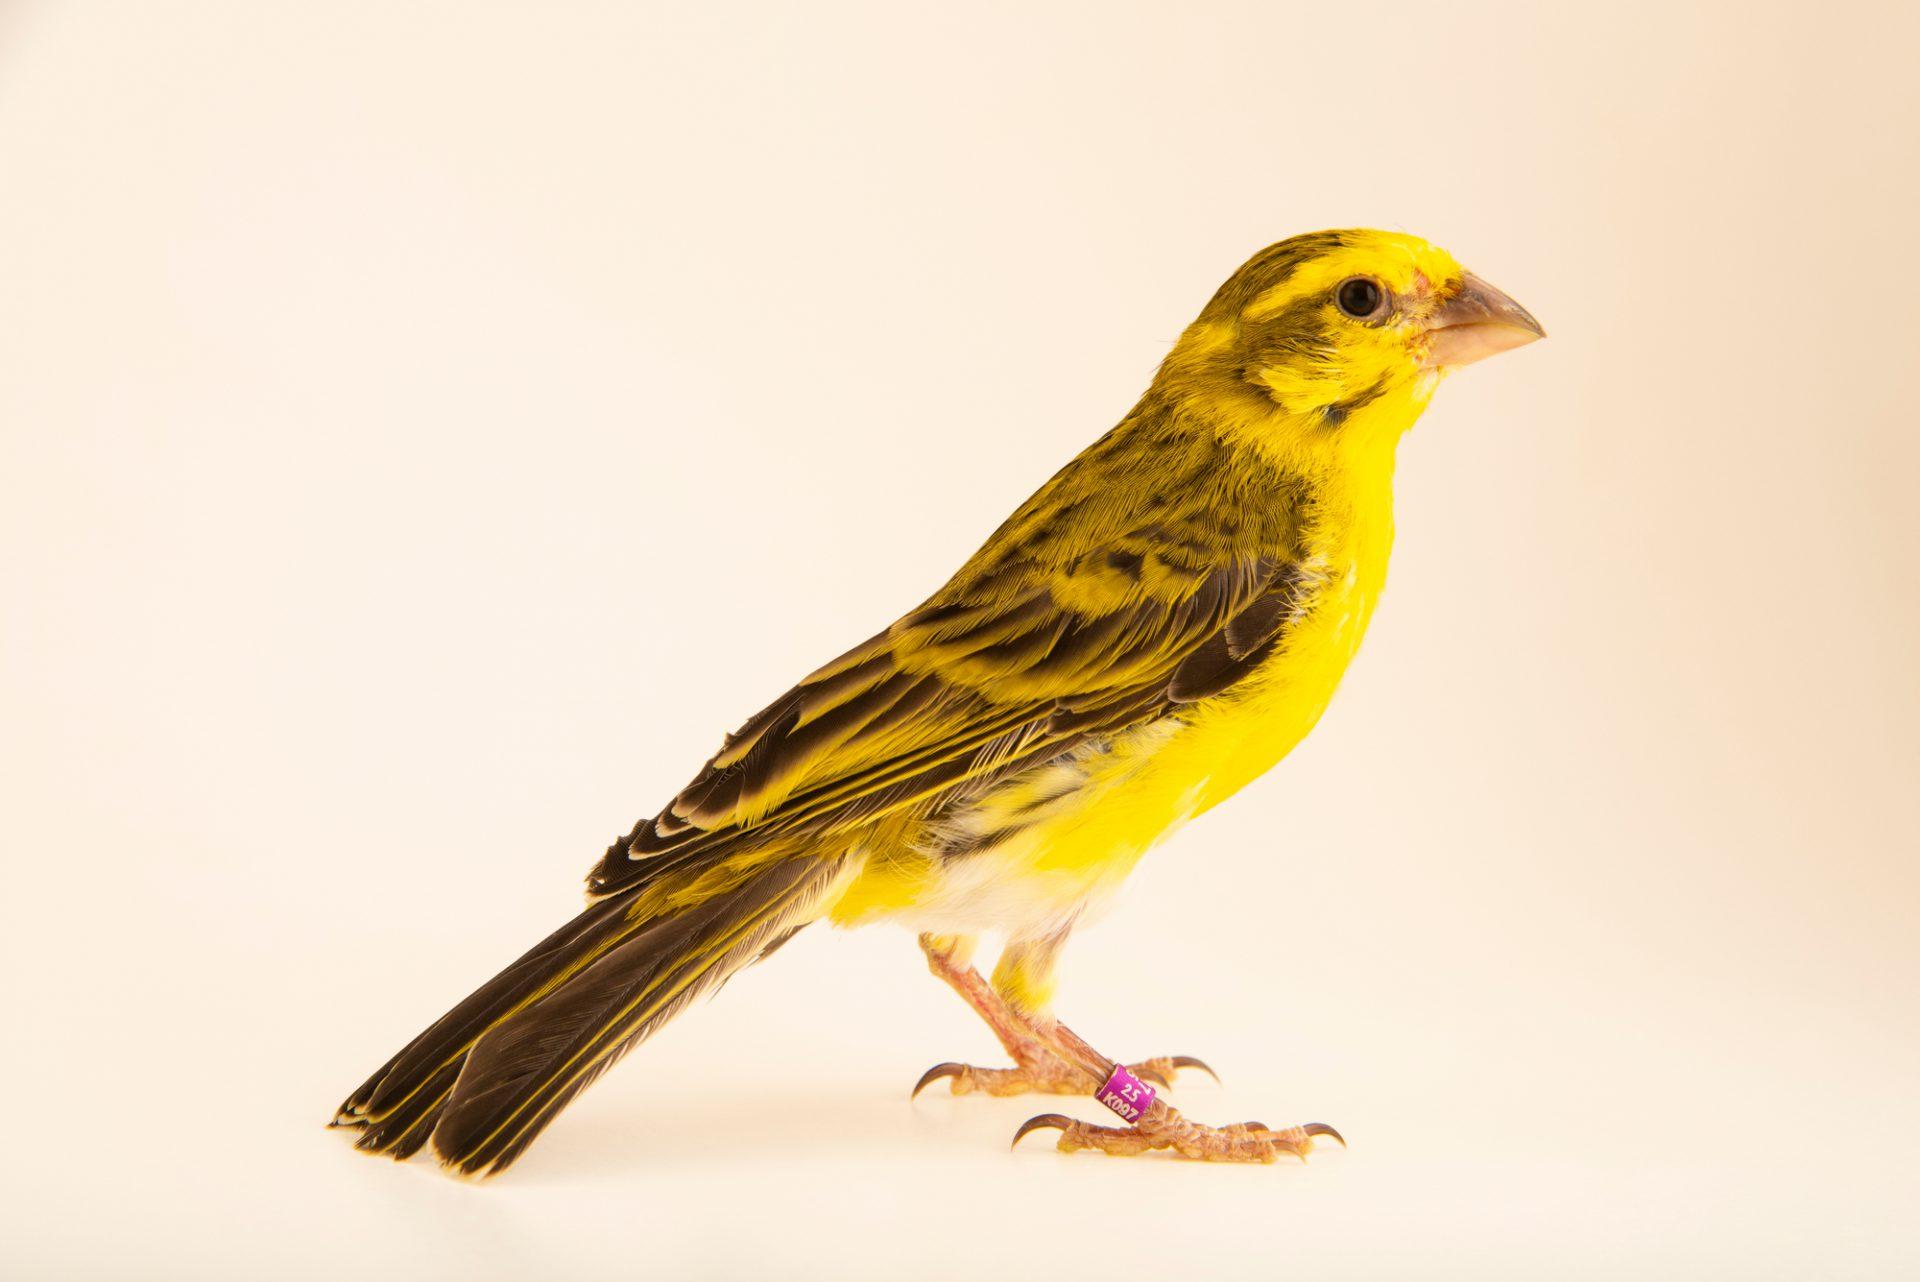 Photo: White-bellied canary (Serinus dorsostriatus) in Santa Cruz, Tenerife, Spain.